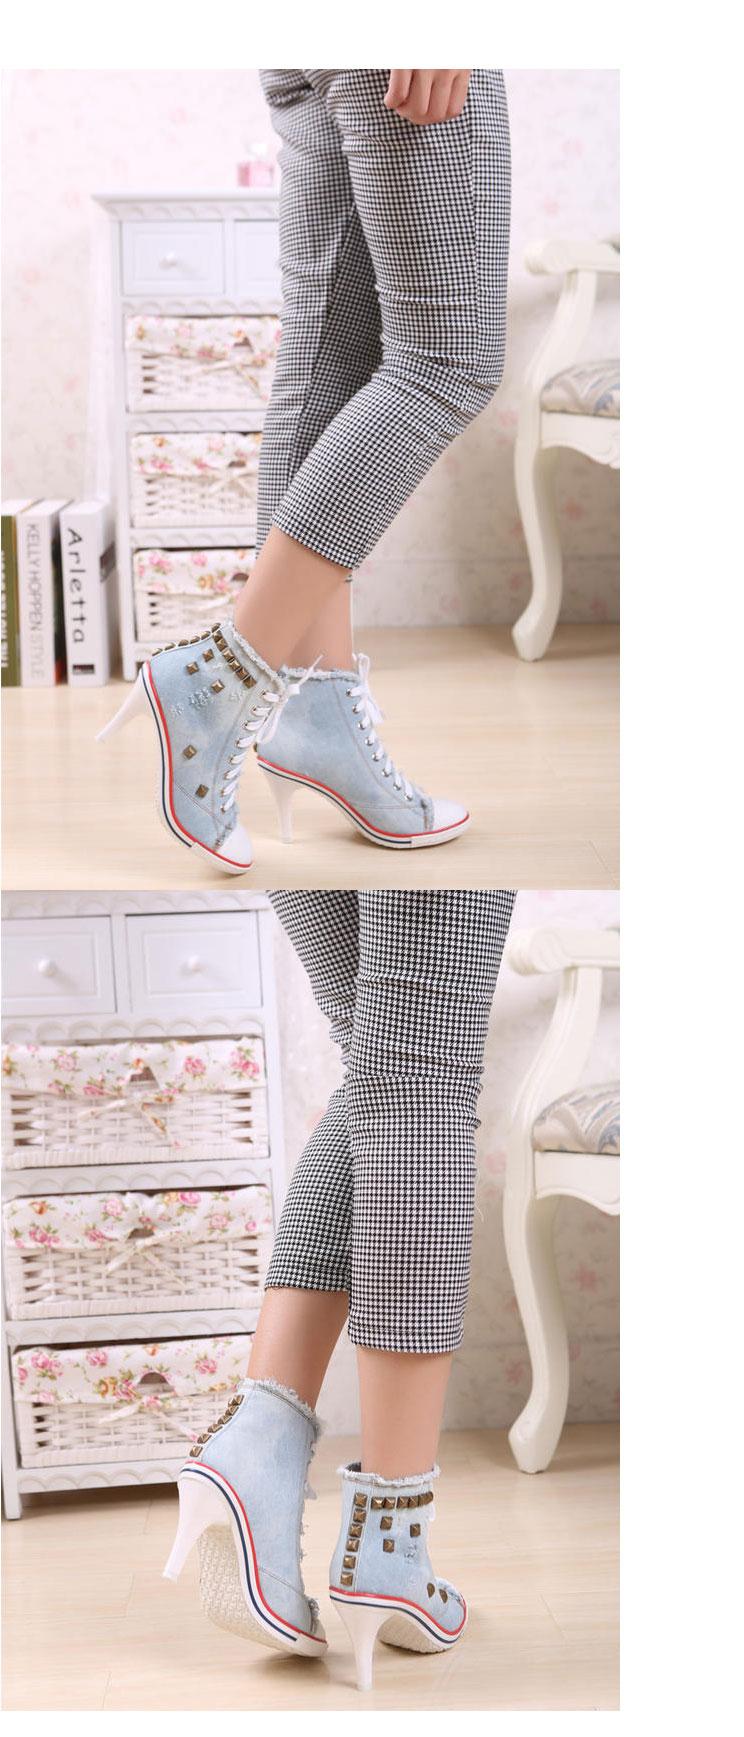 Aliexpress.com---Buy-Women-canvas-shoes-denim-high_09